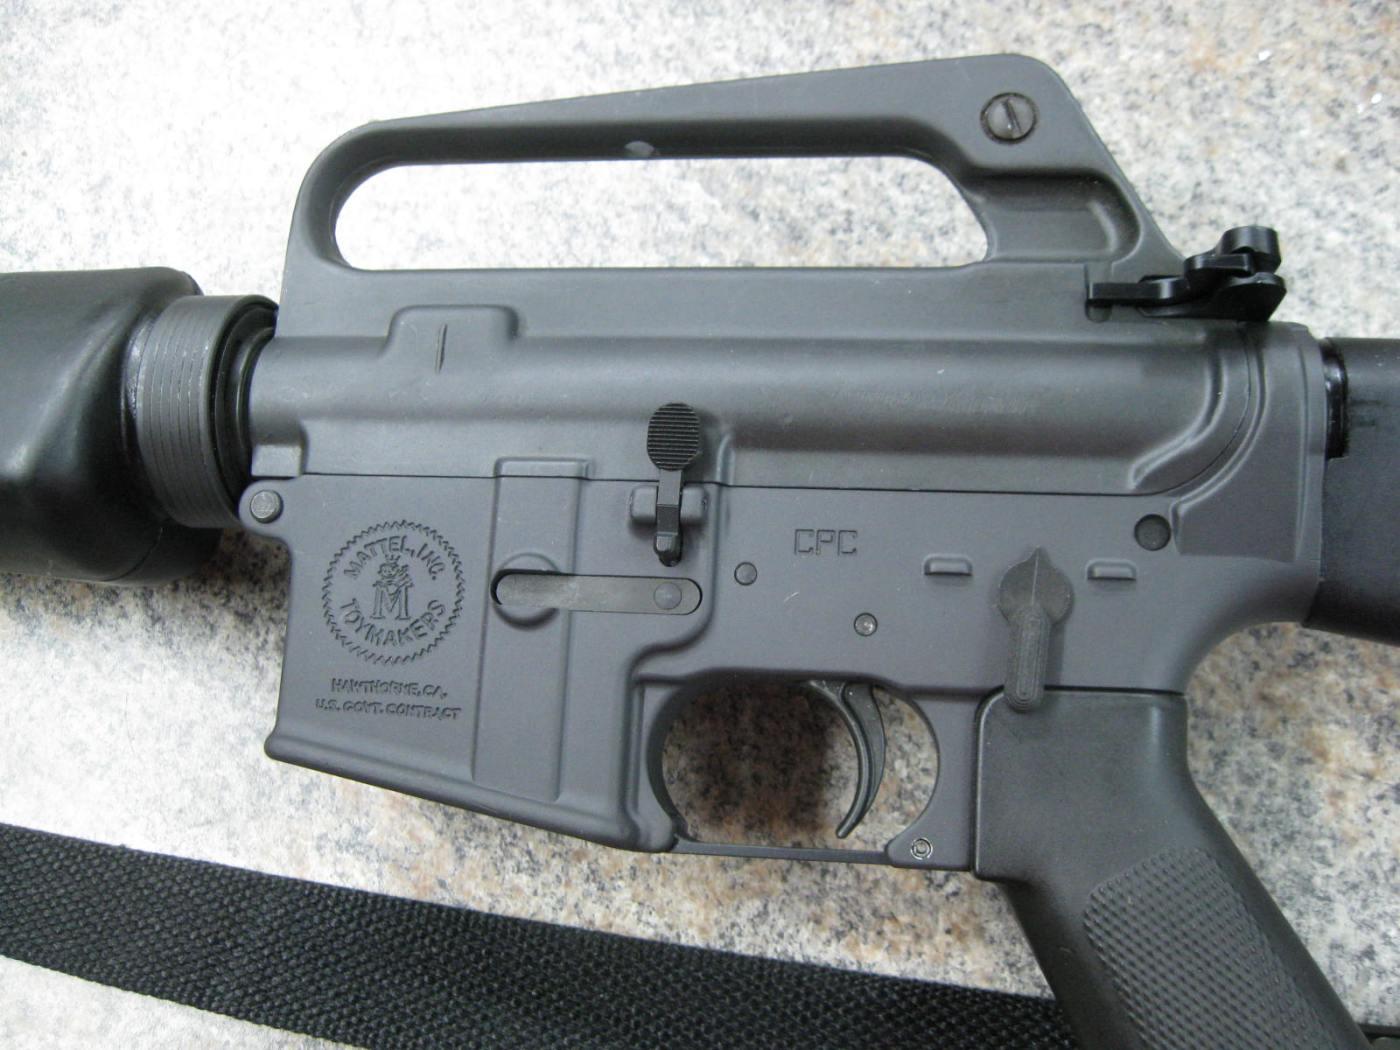 The AR-15 Rifle: Good, Bad, or Ban?